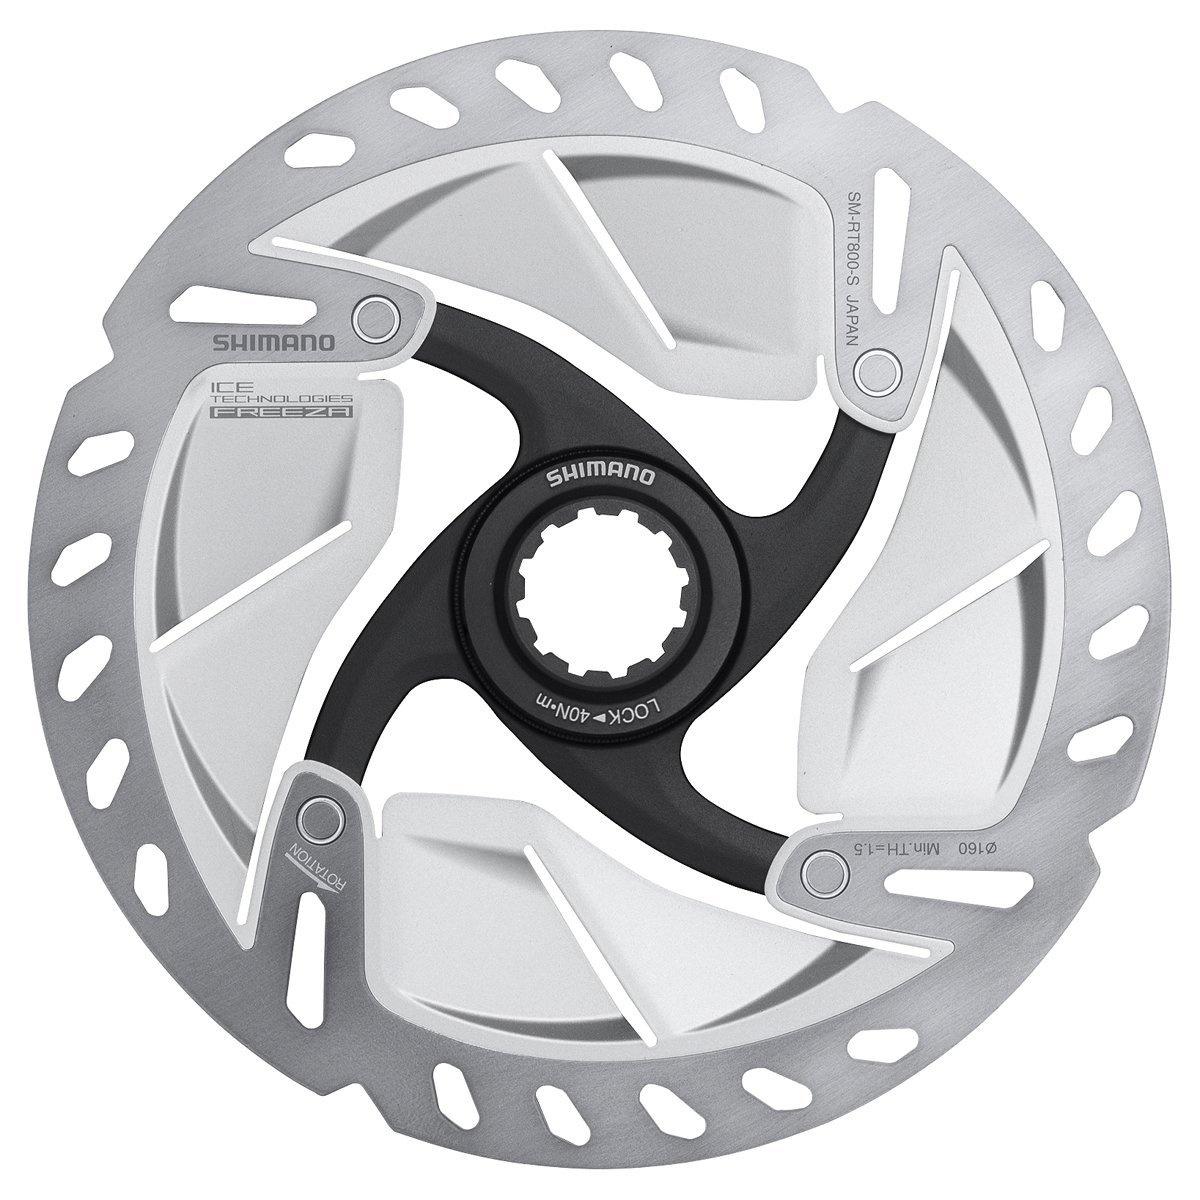 Shimano Bremseskive 160mm Center Lock SM-RT800 Ice-Tech Freeza